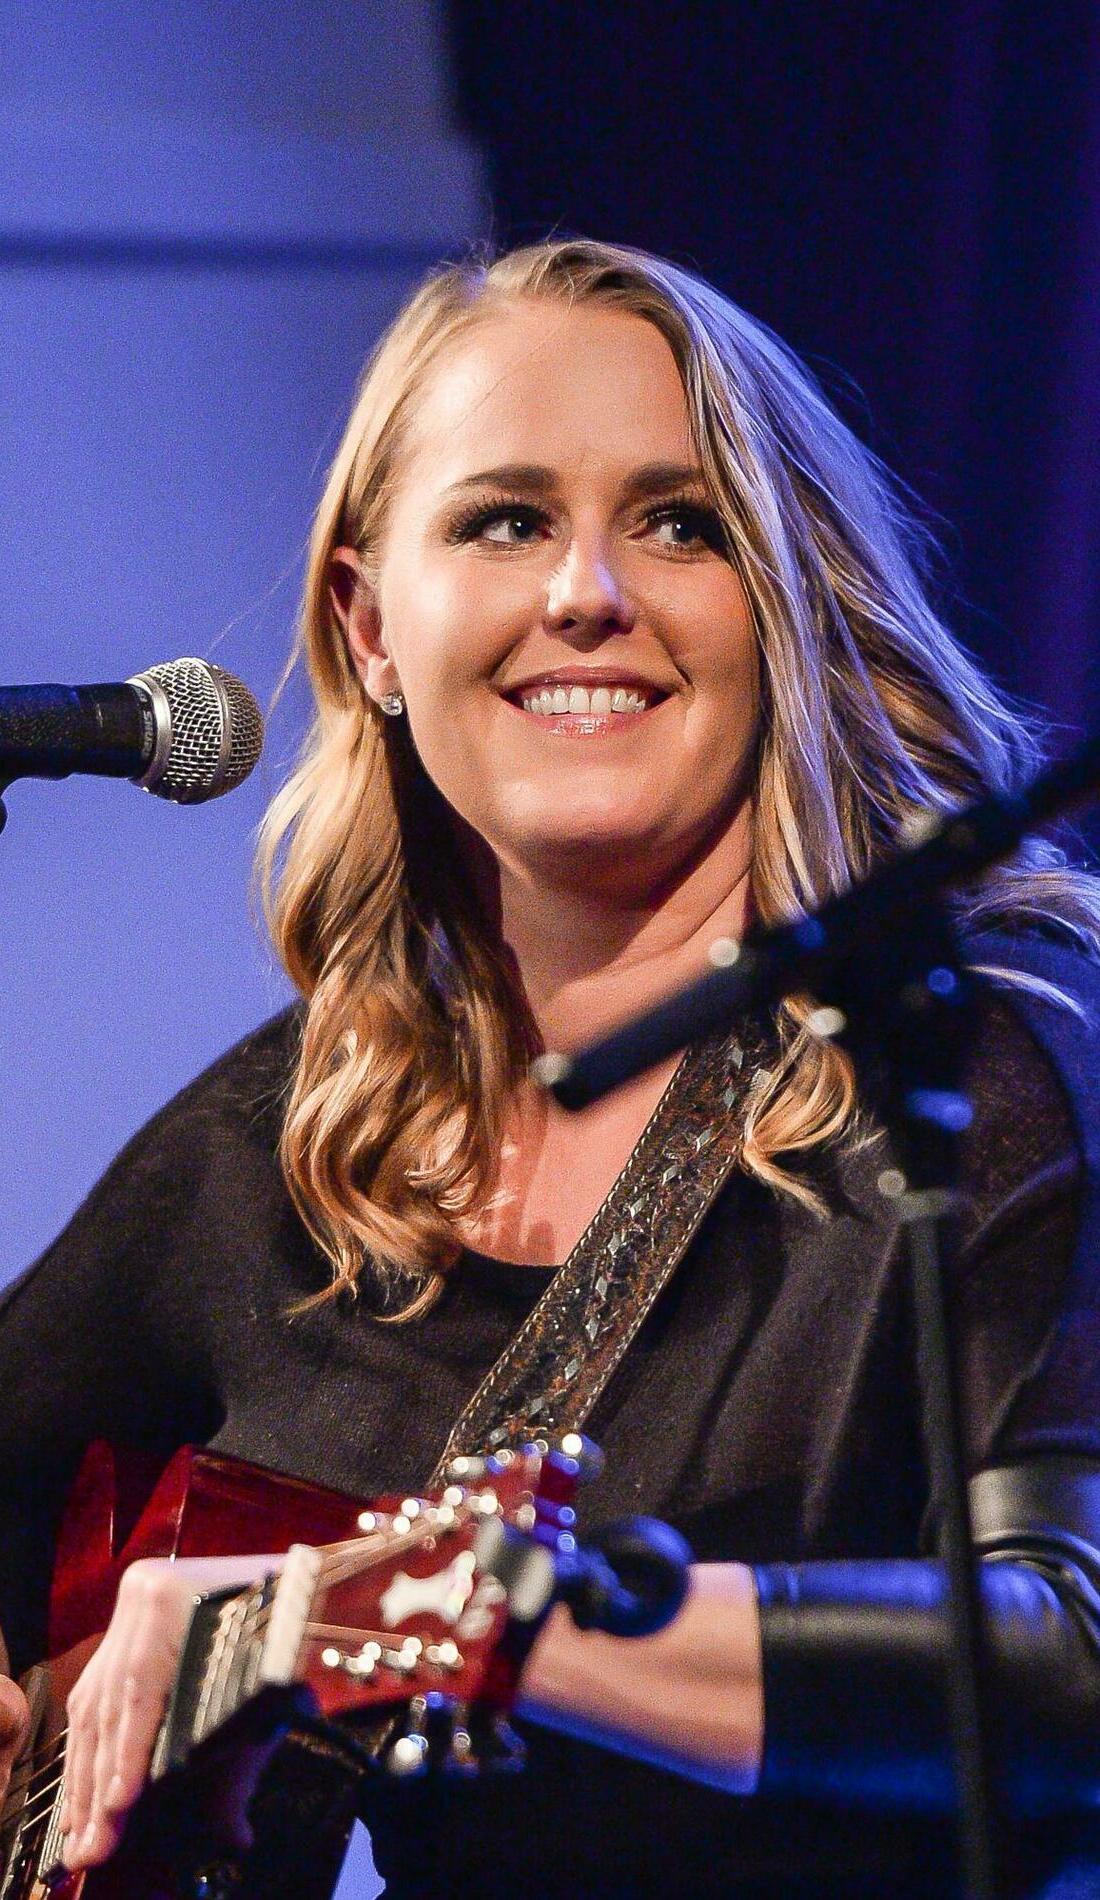 A Jessica Mitchell live event